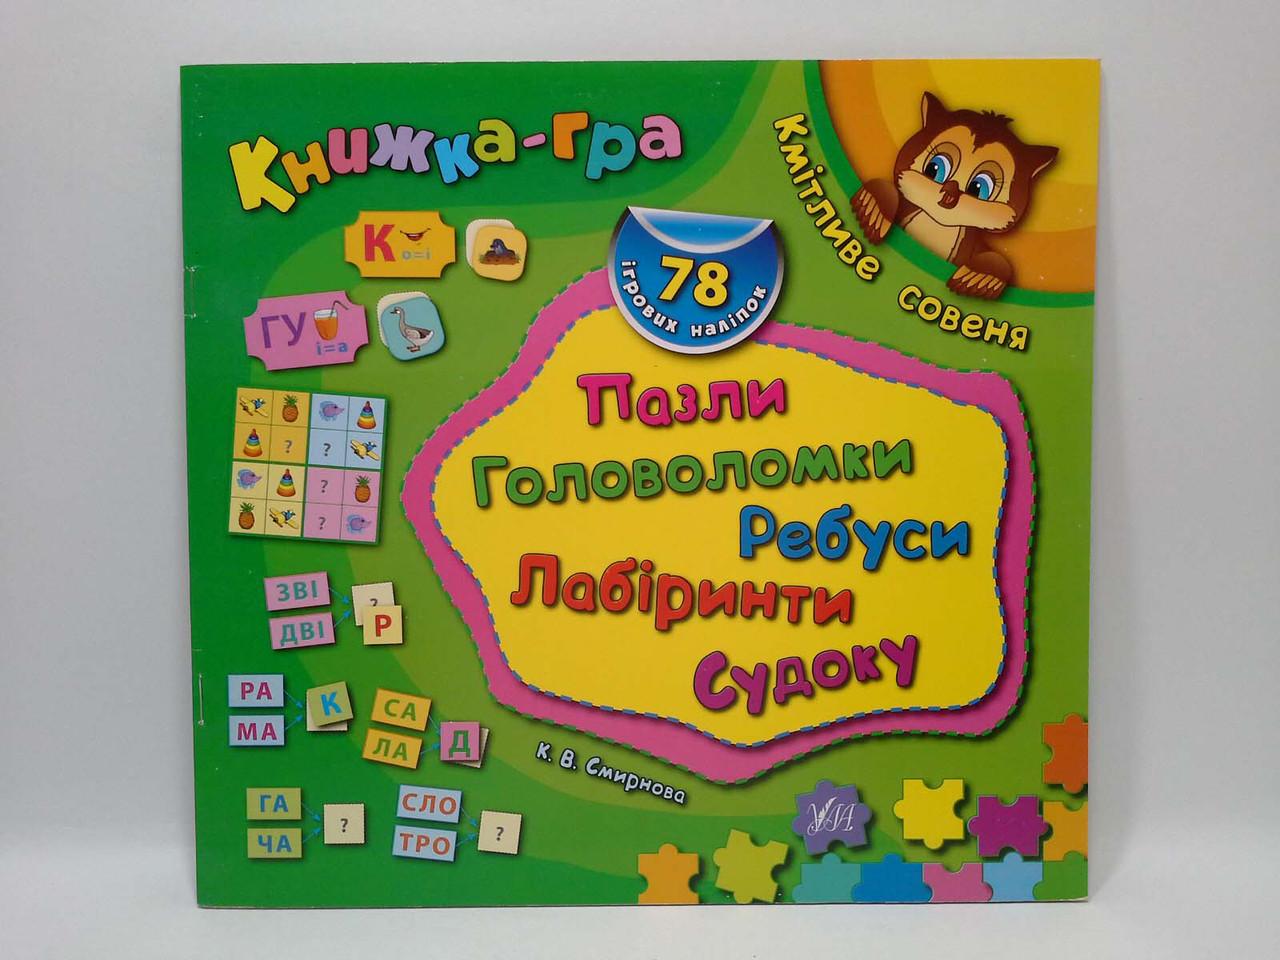 УЛА Книжка гра Кмітливе совеня Пазли головоломки ребуси лабіринти